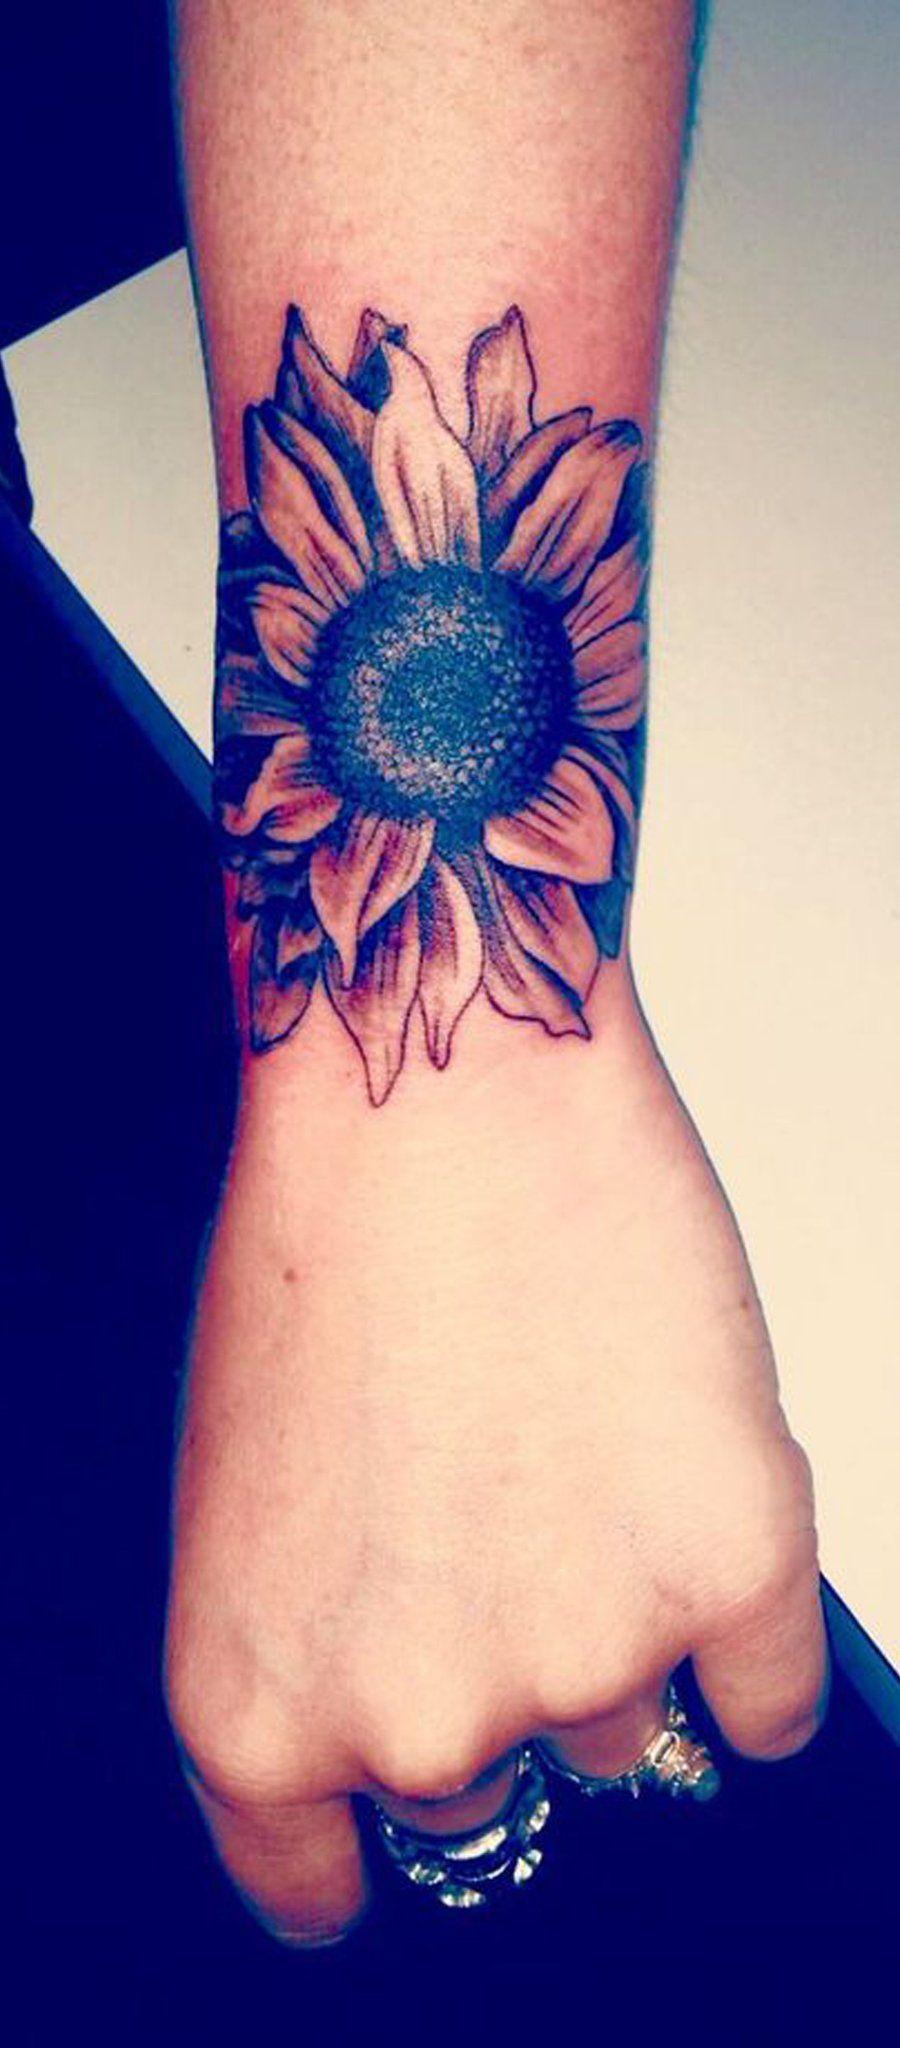 20 Of The Most Boujee Sunflower Tattoo Ideas Tattoo Flower